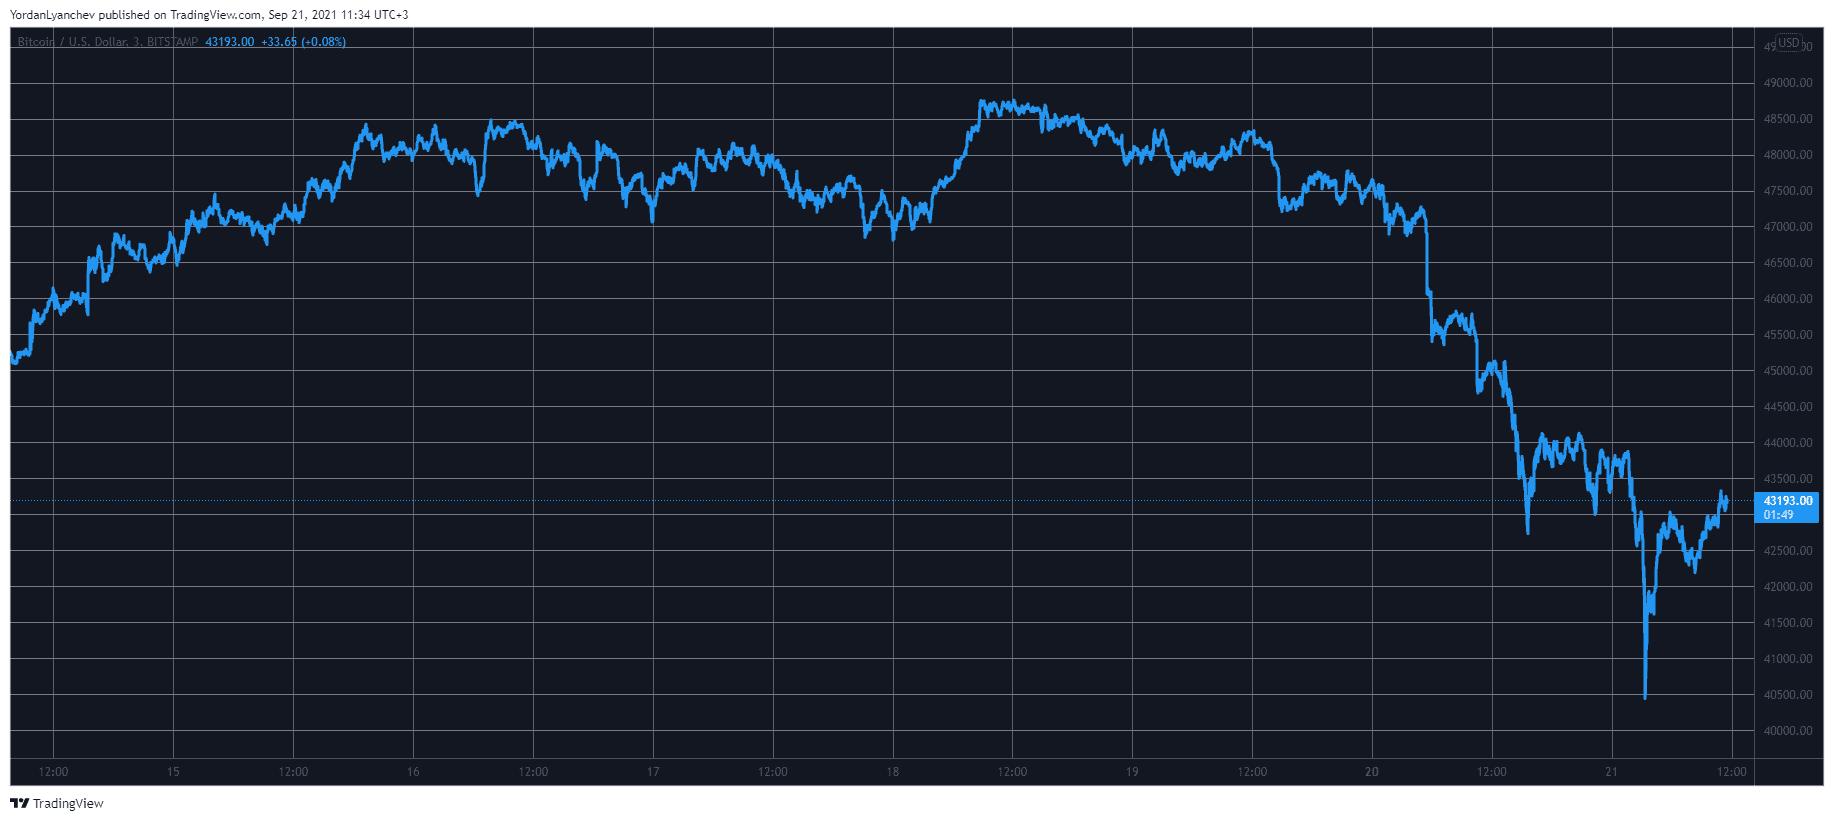 Bitcoin Dipped to $40K Amid Global Stocks Pullback (Market Watch)